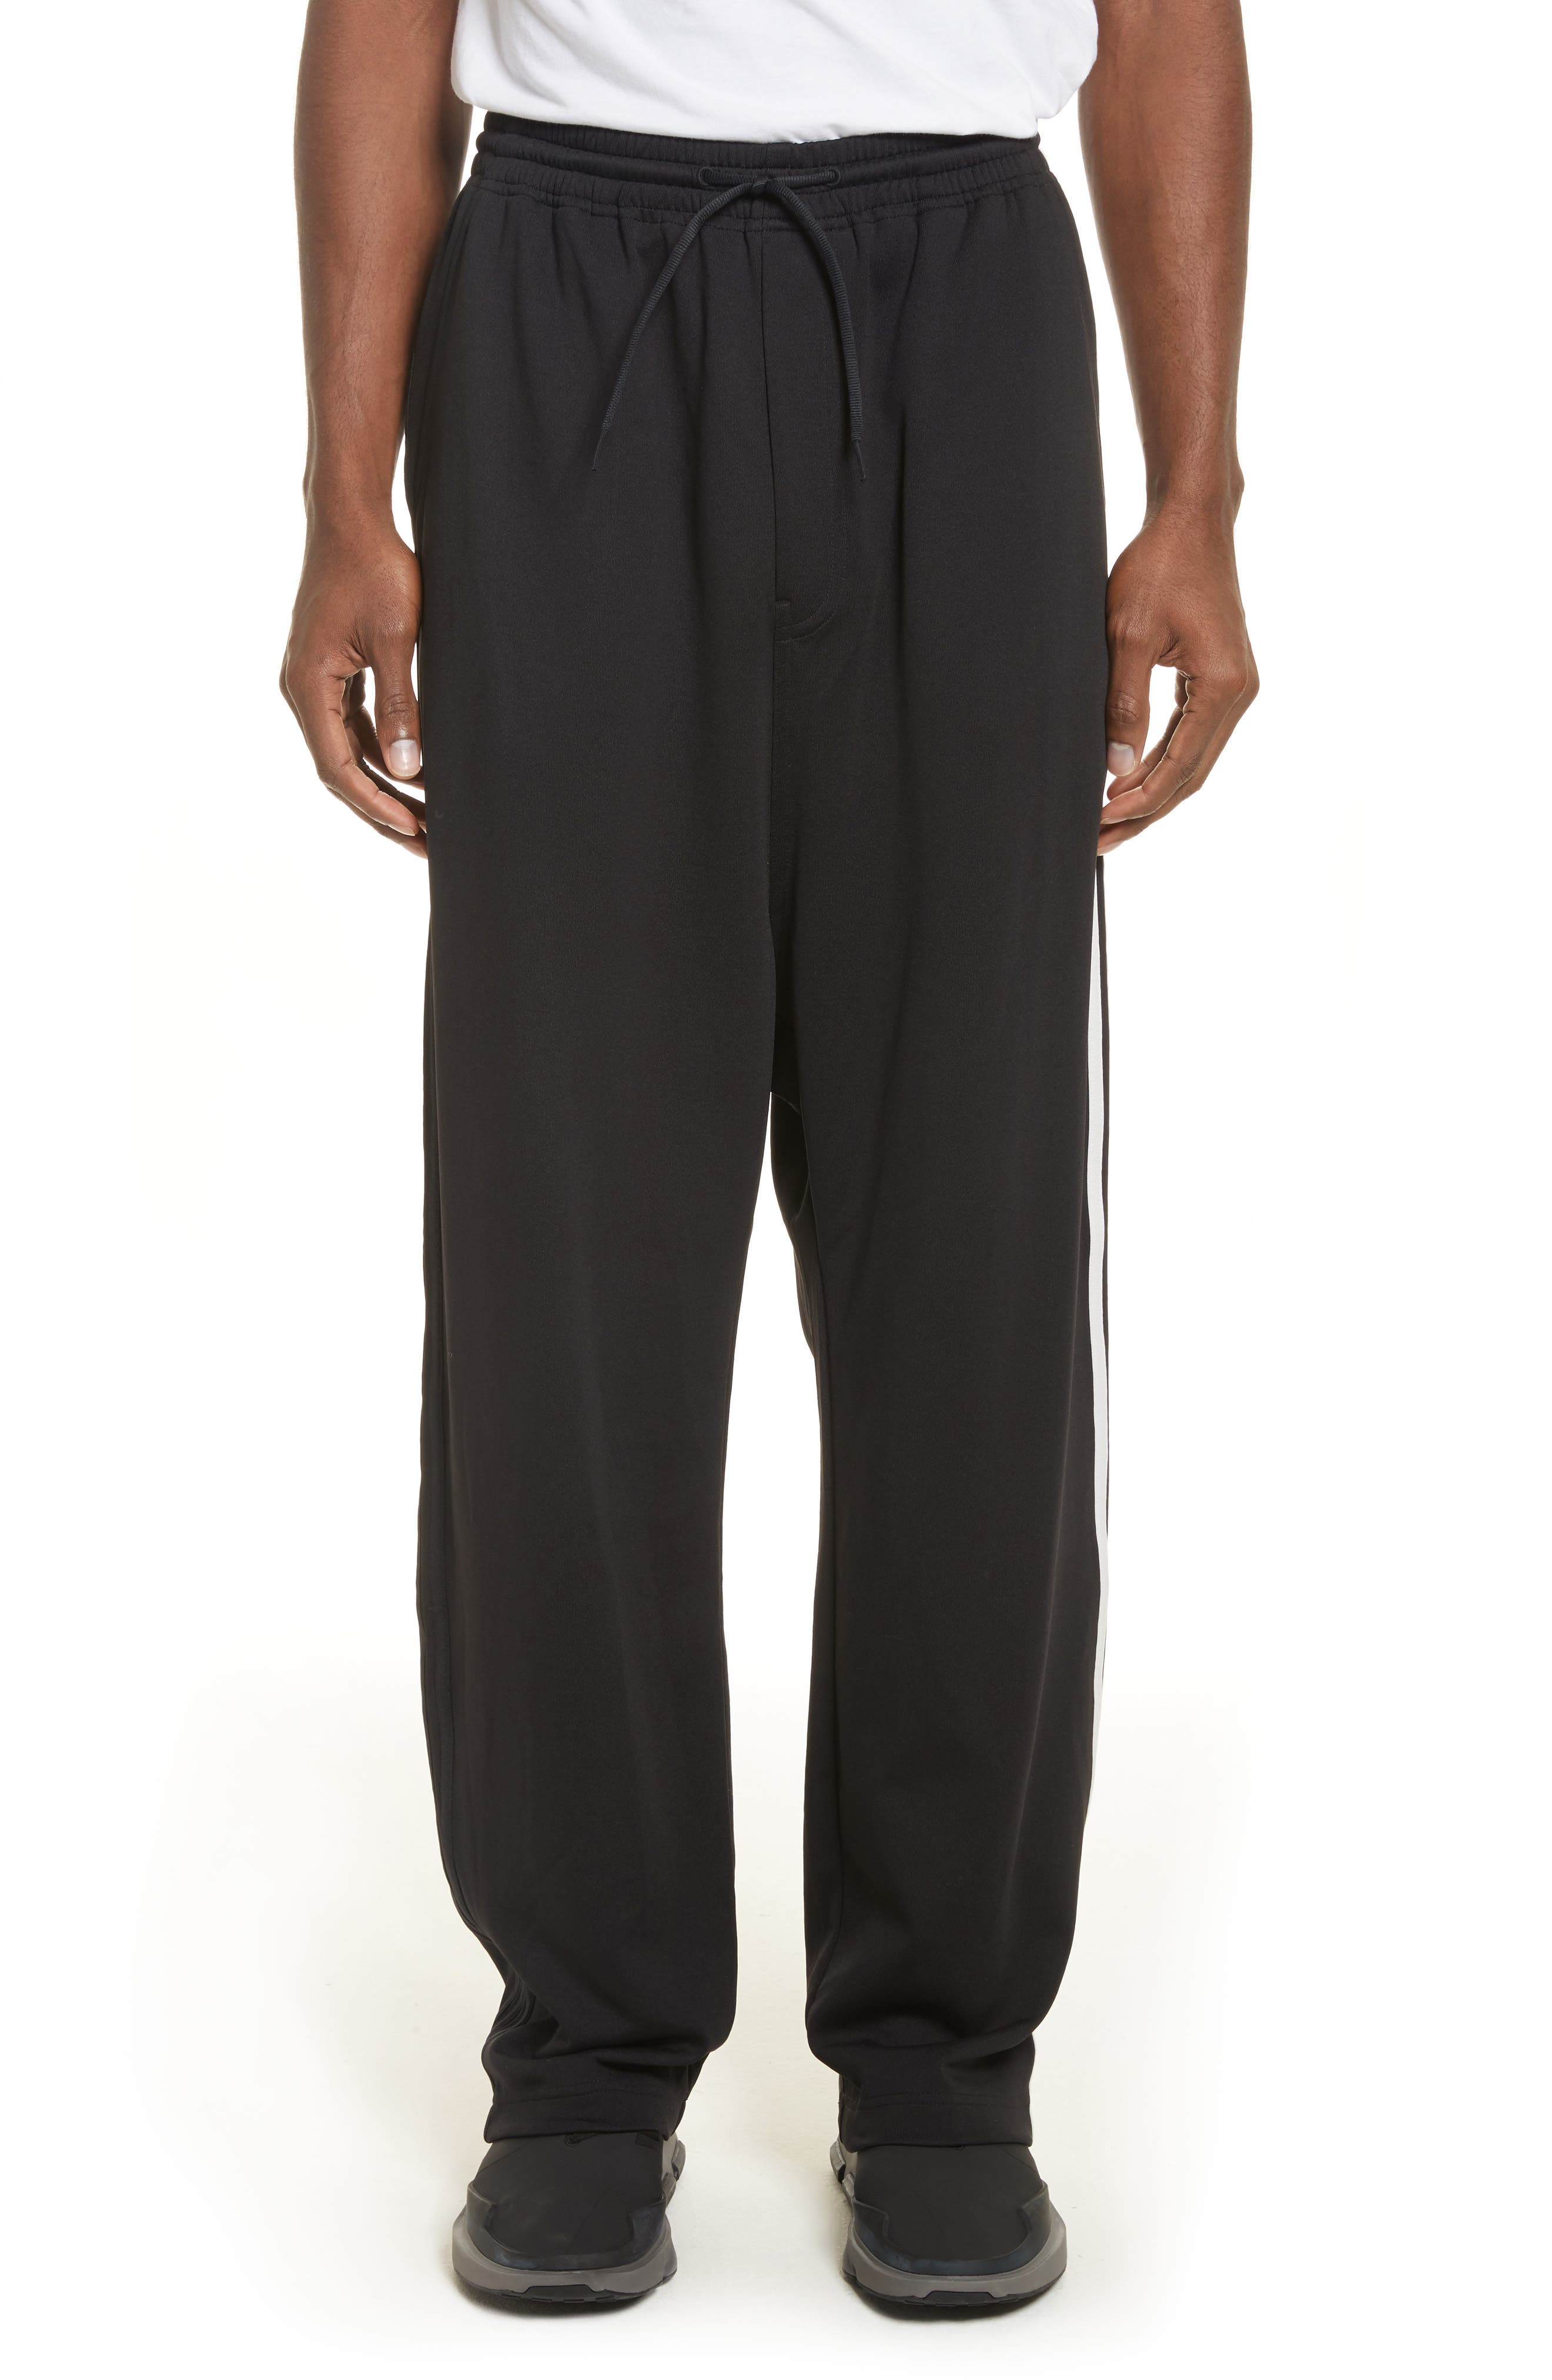 Y-3 x adidas Wide Leg Track Pants